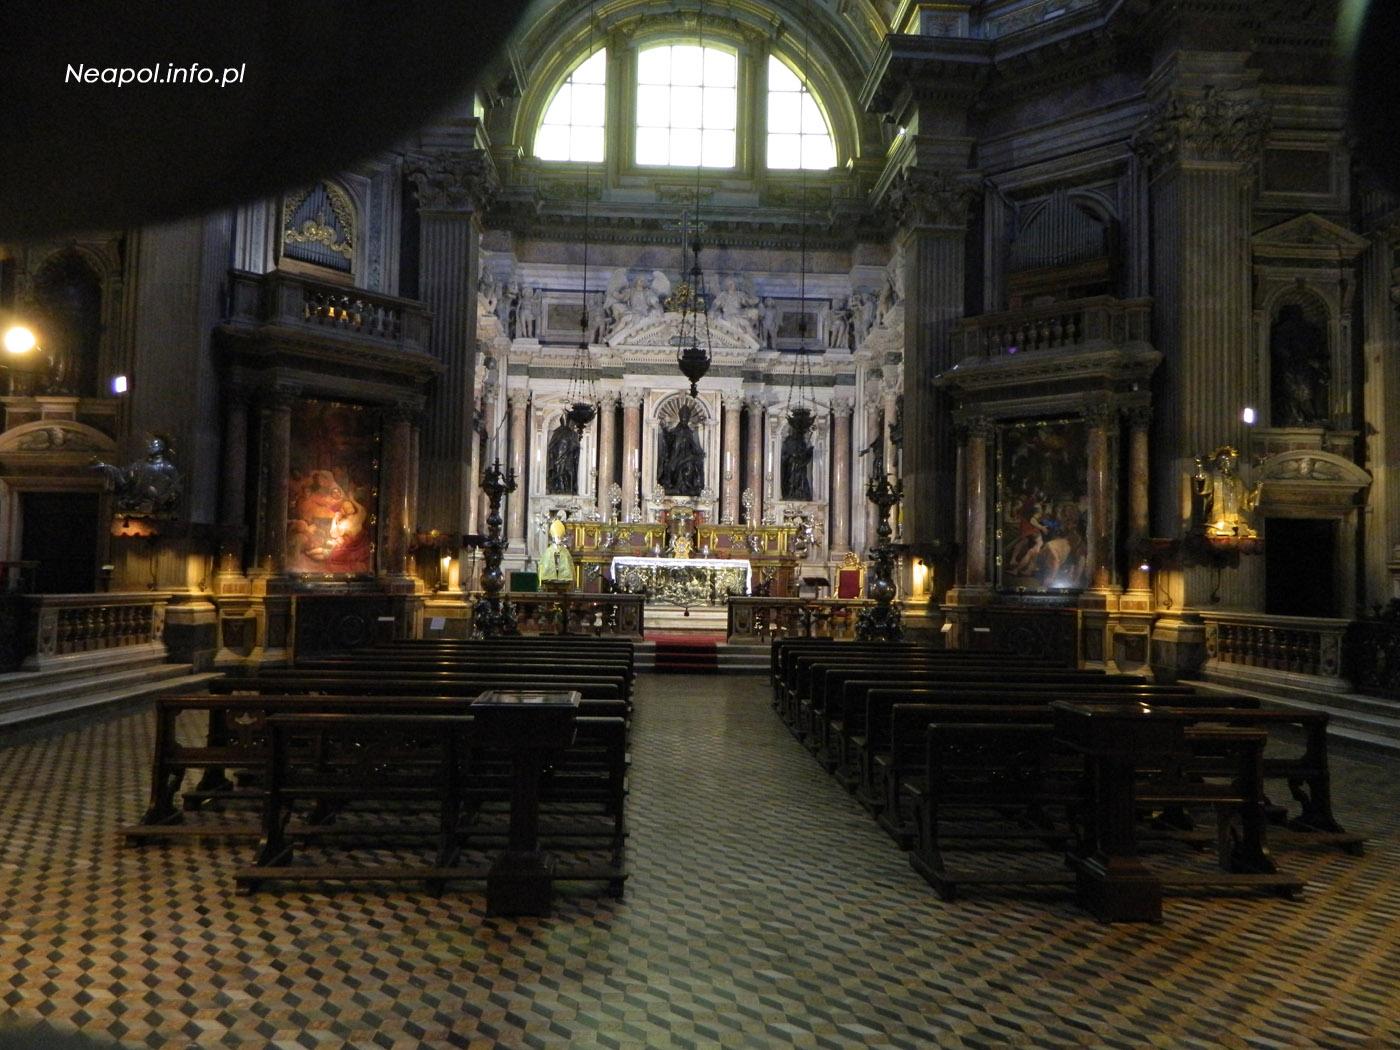 Duomo - Katedra w Neapolu